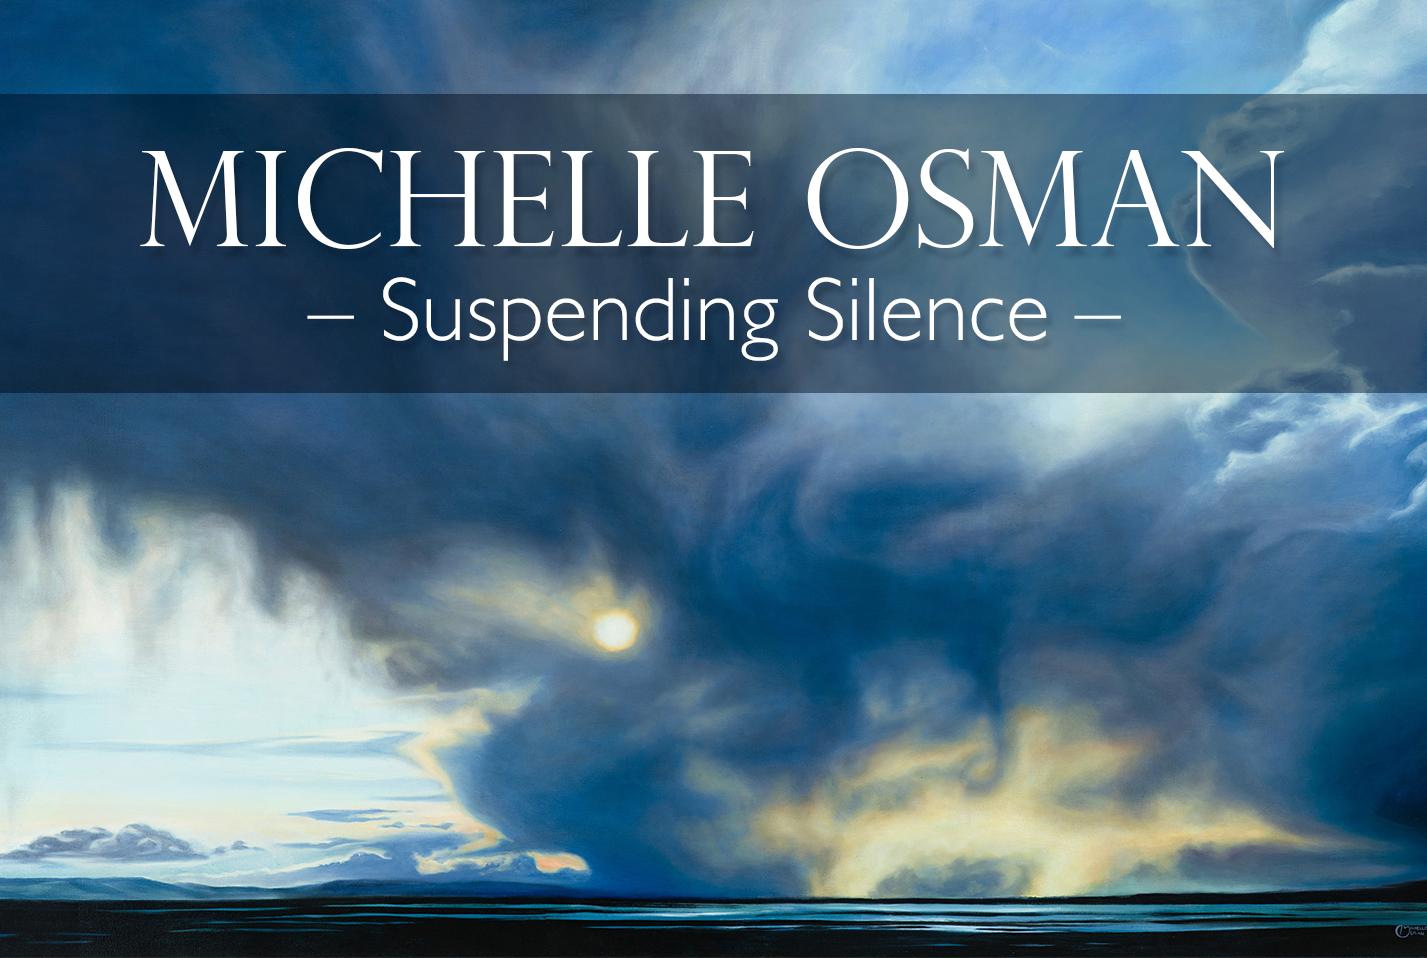 Michelle Osman - Suspending Silence